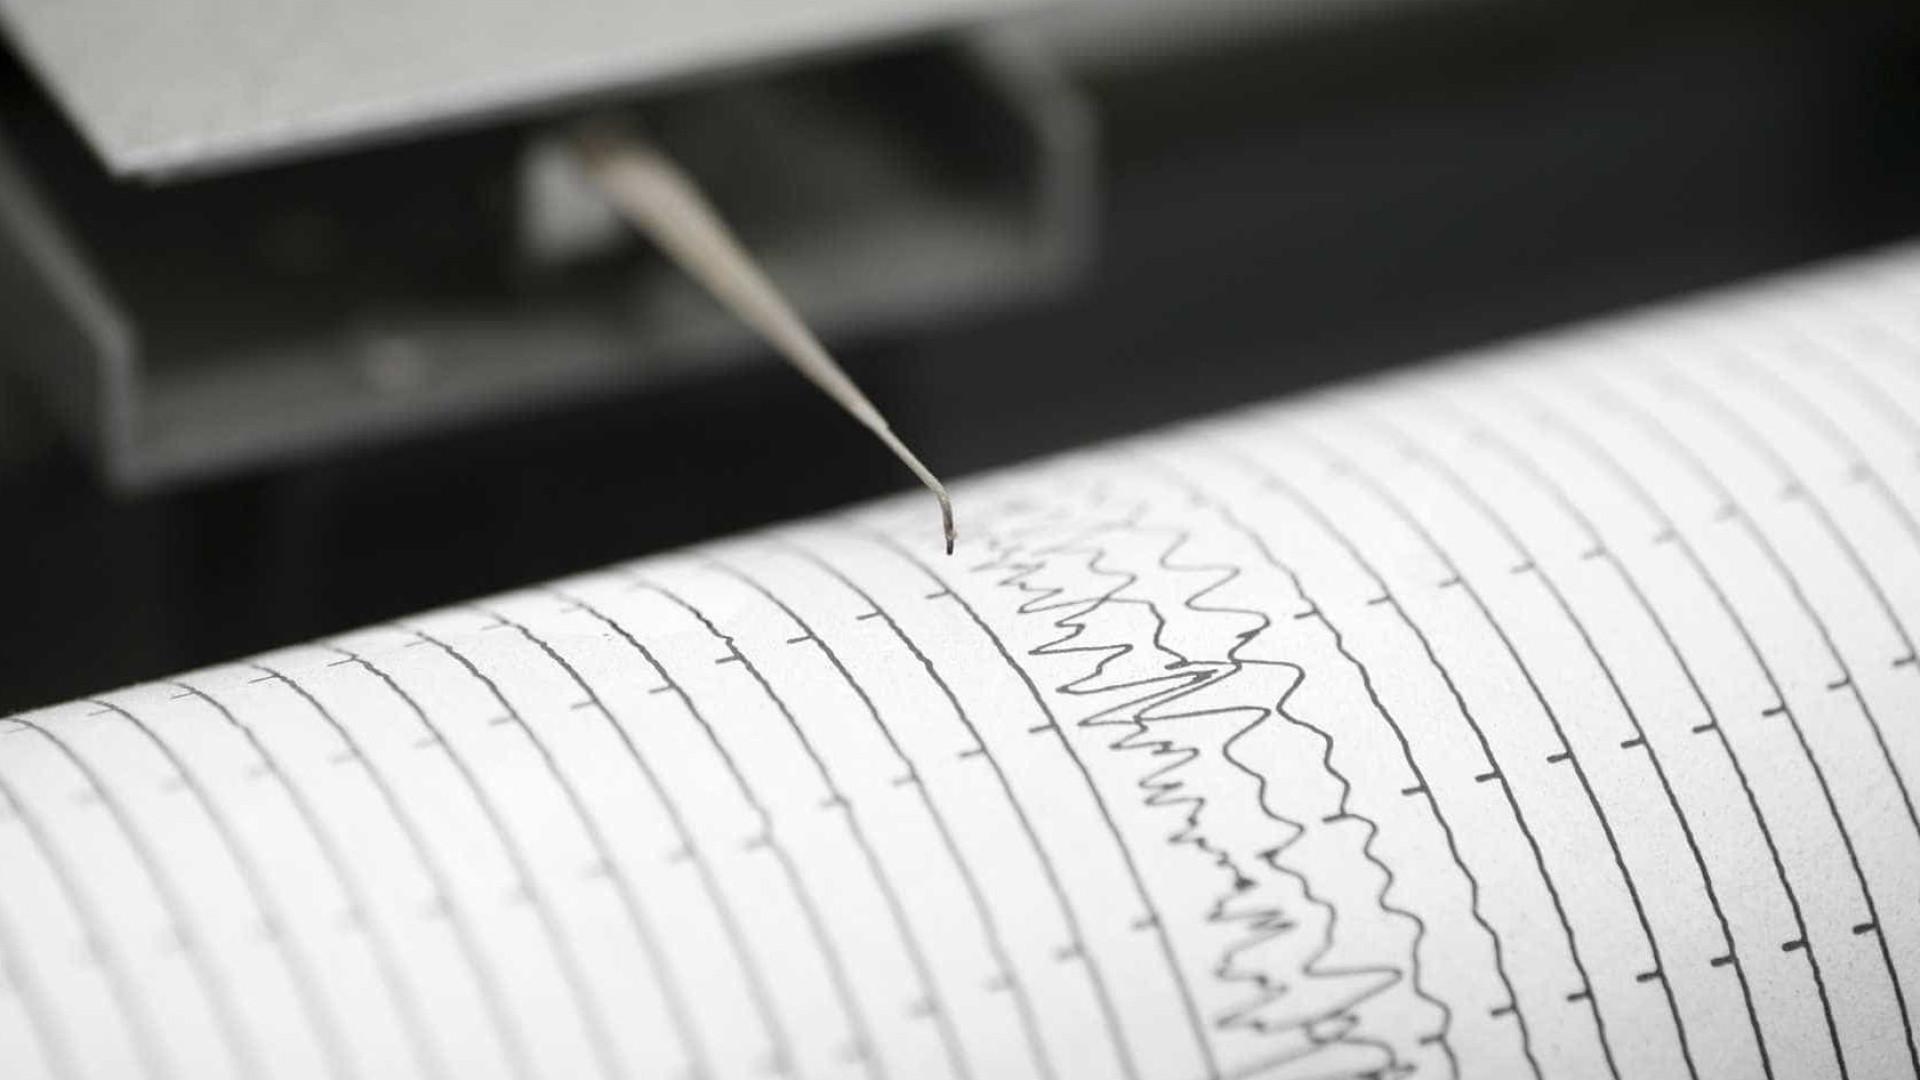 Terremoto de magnitude 5.2 na Turquia